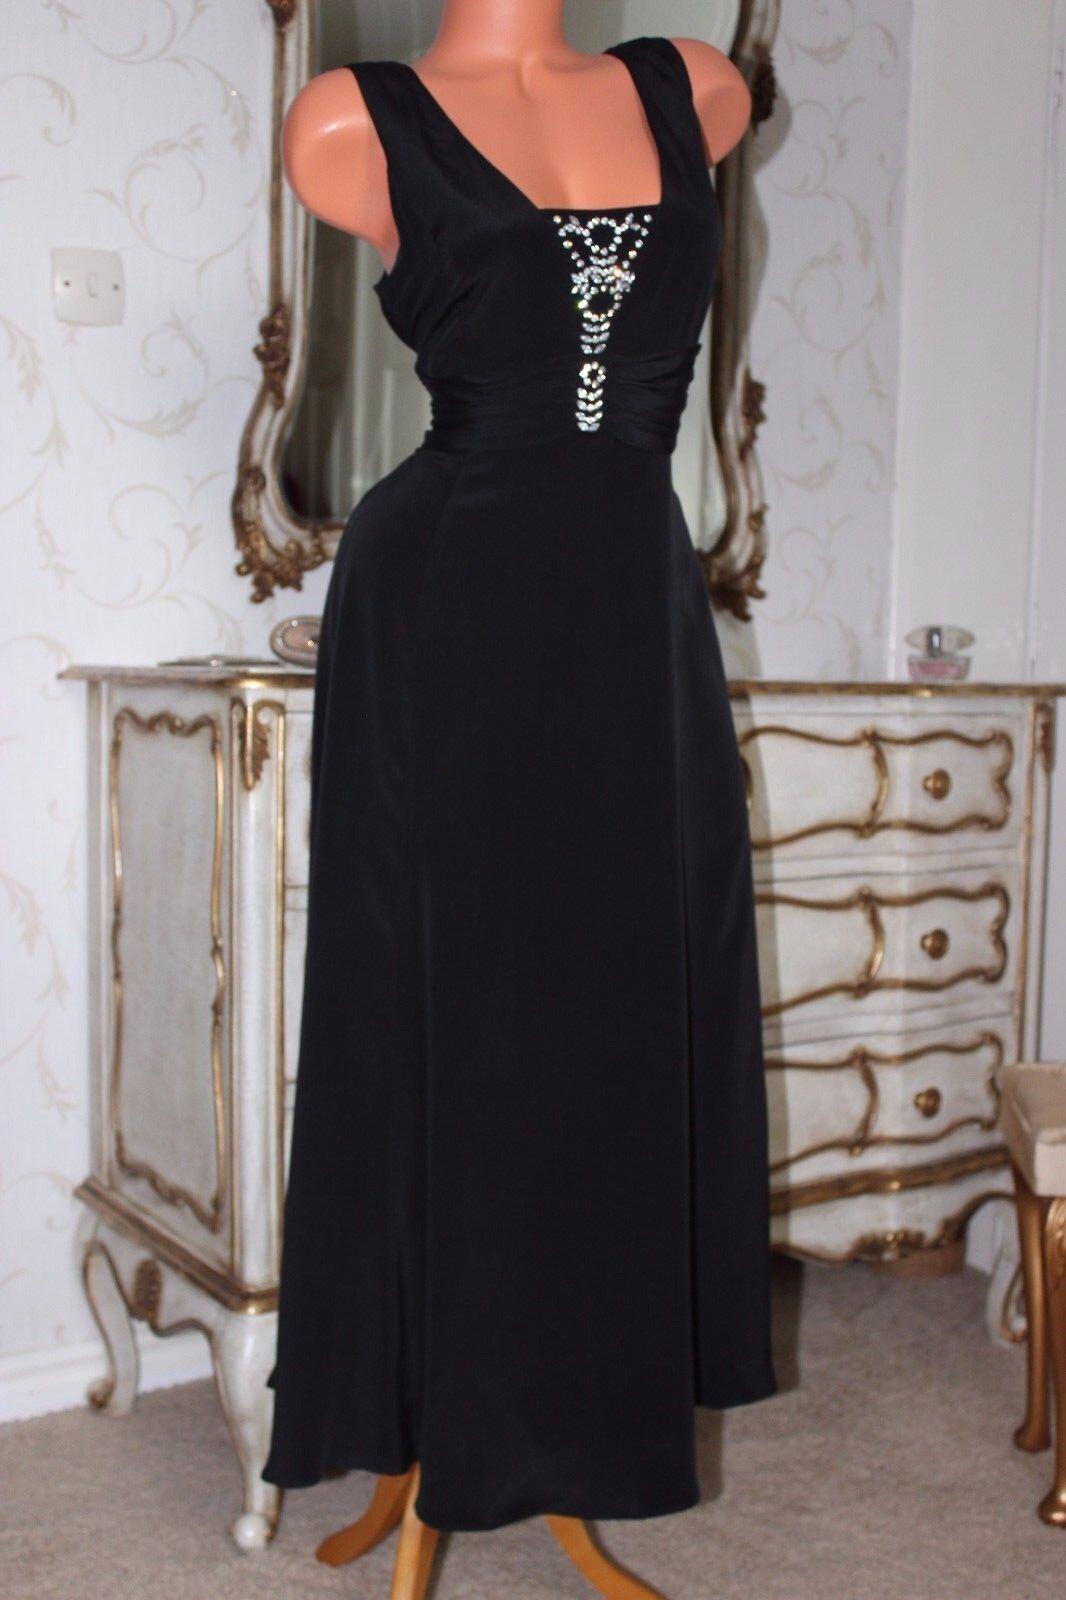 R1 KALIKO 100% Pura Seta Nera Nera Nera Pietra Impreziosito piena lunghezza Dress Dimensione 12 143789